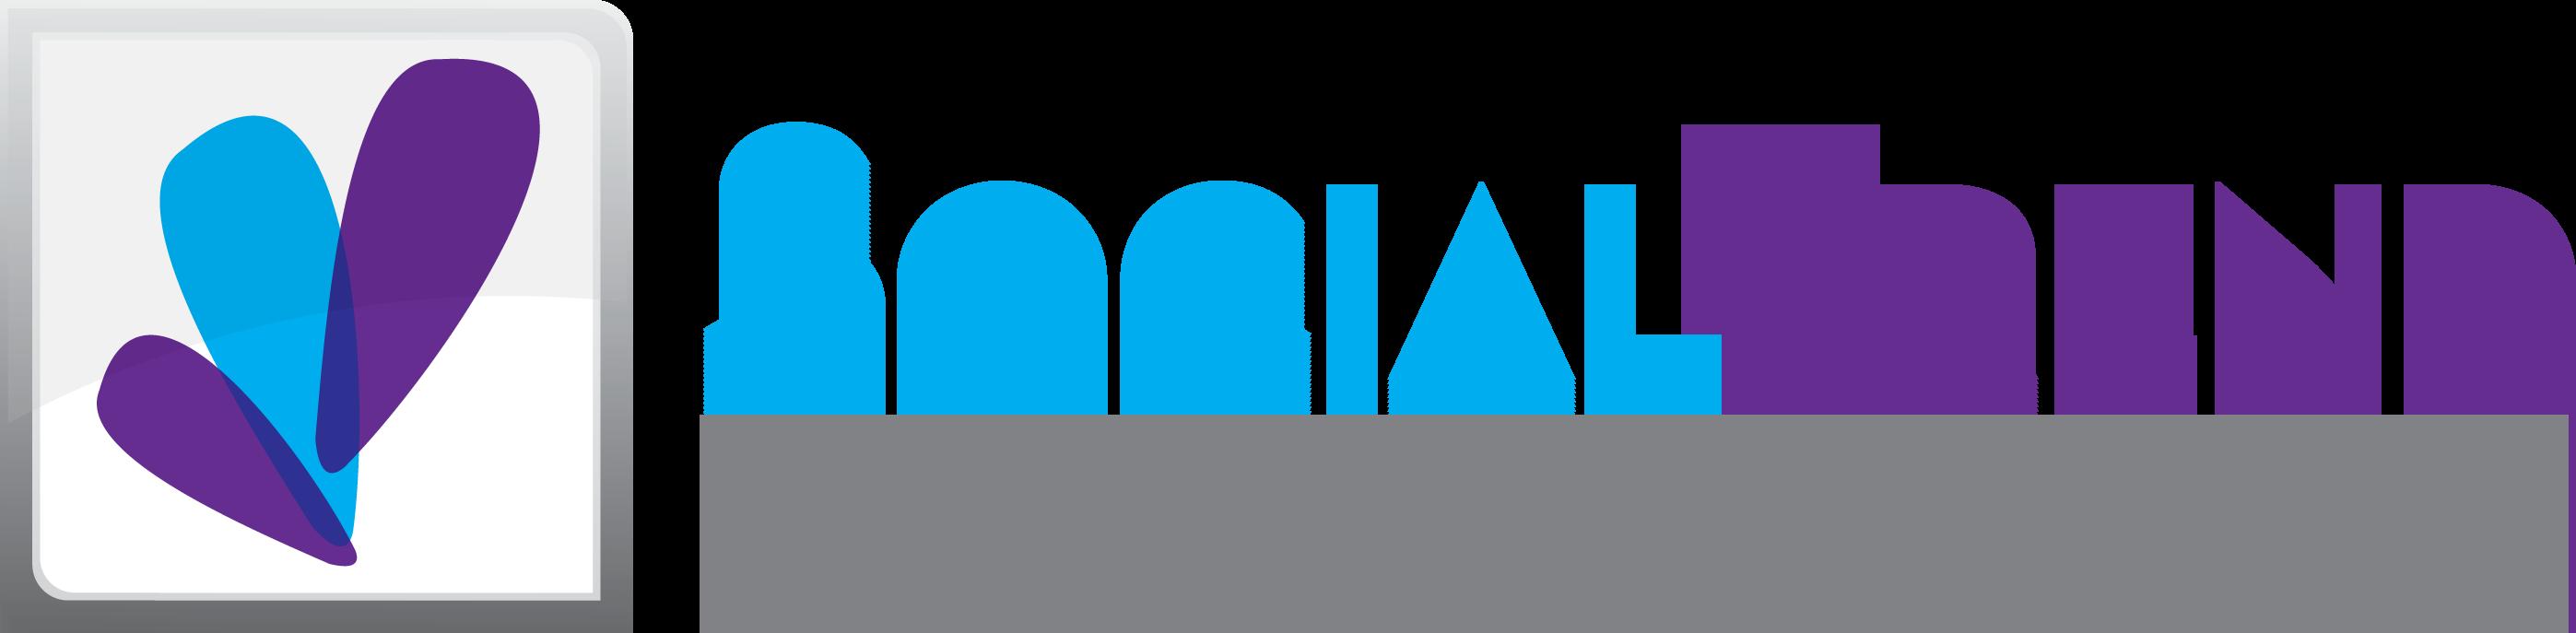 SocialTrend Internet Solutions, LLC